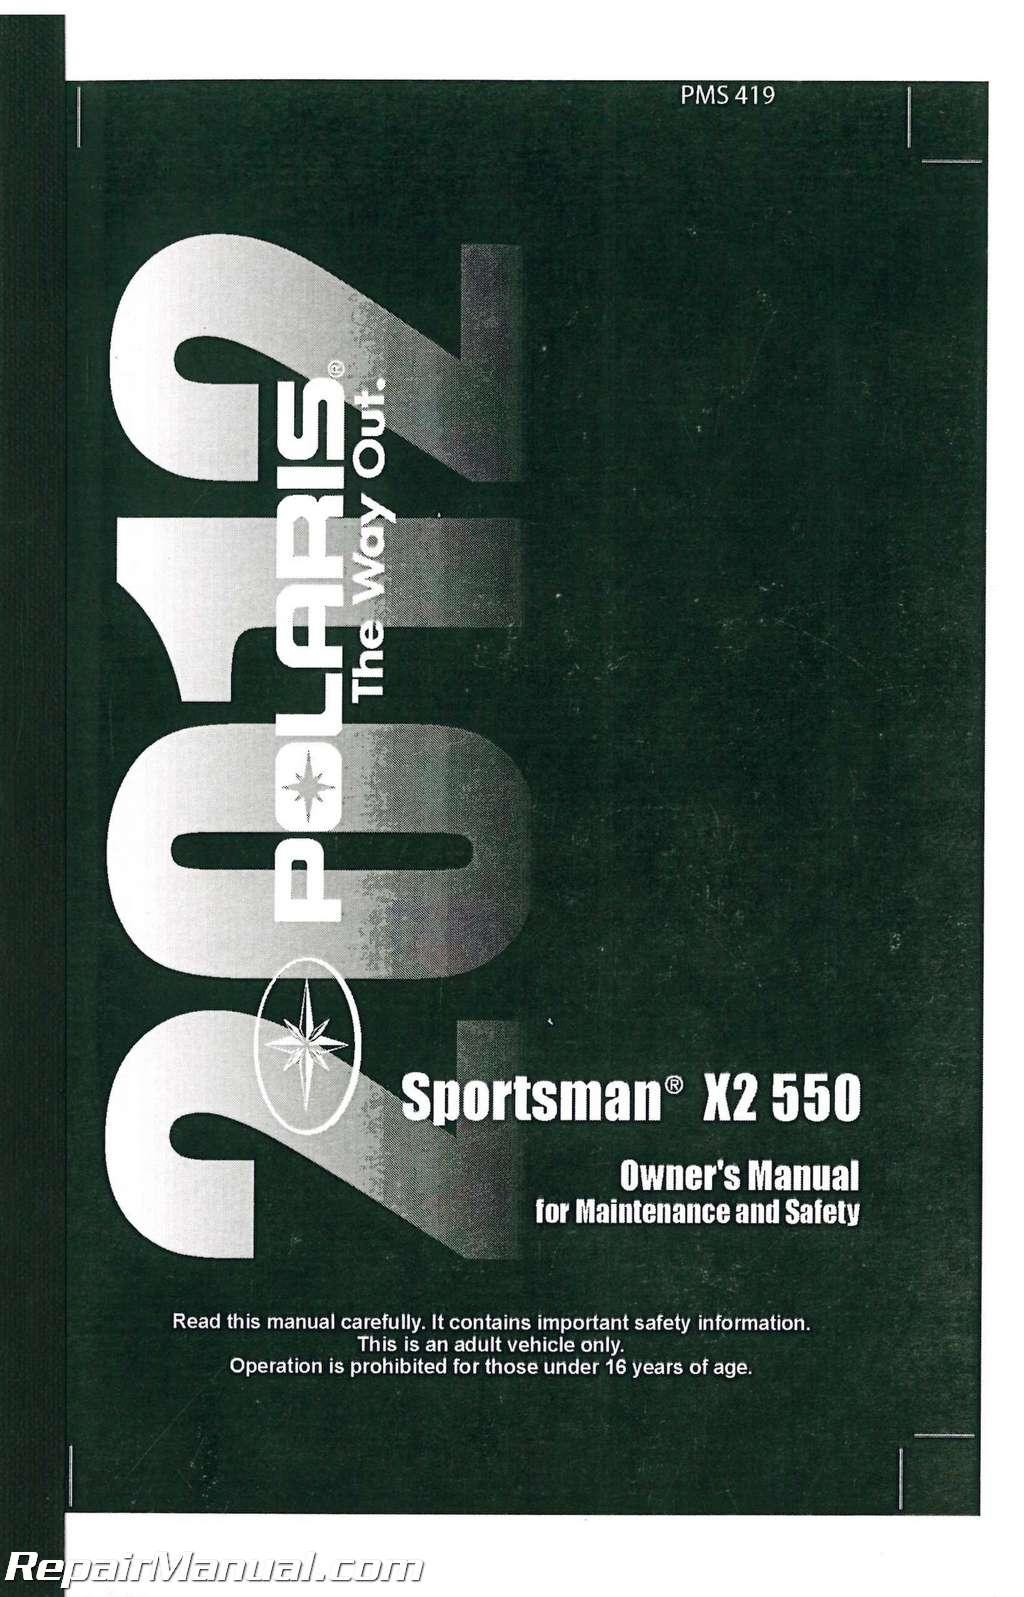 2012 polaris sportsman 550 owners manual